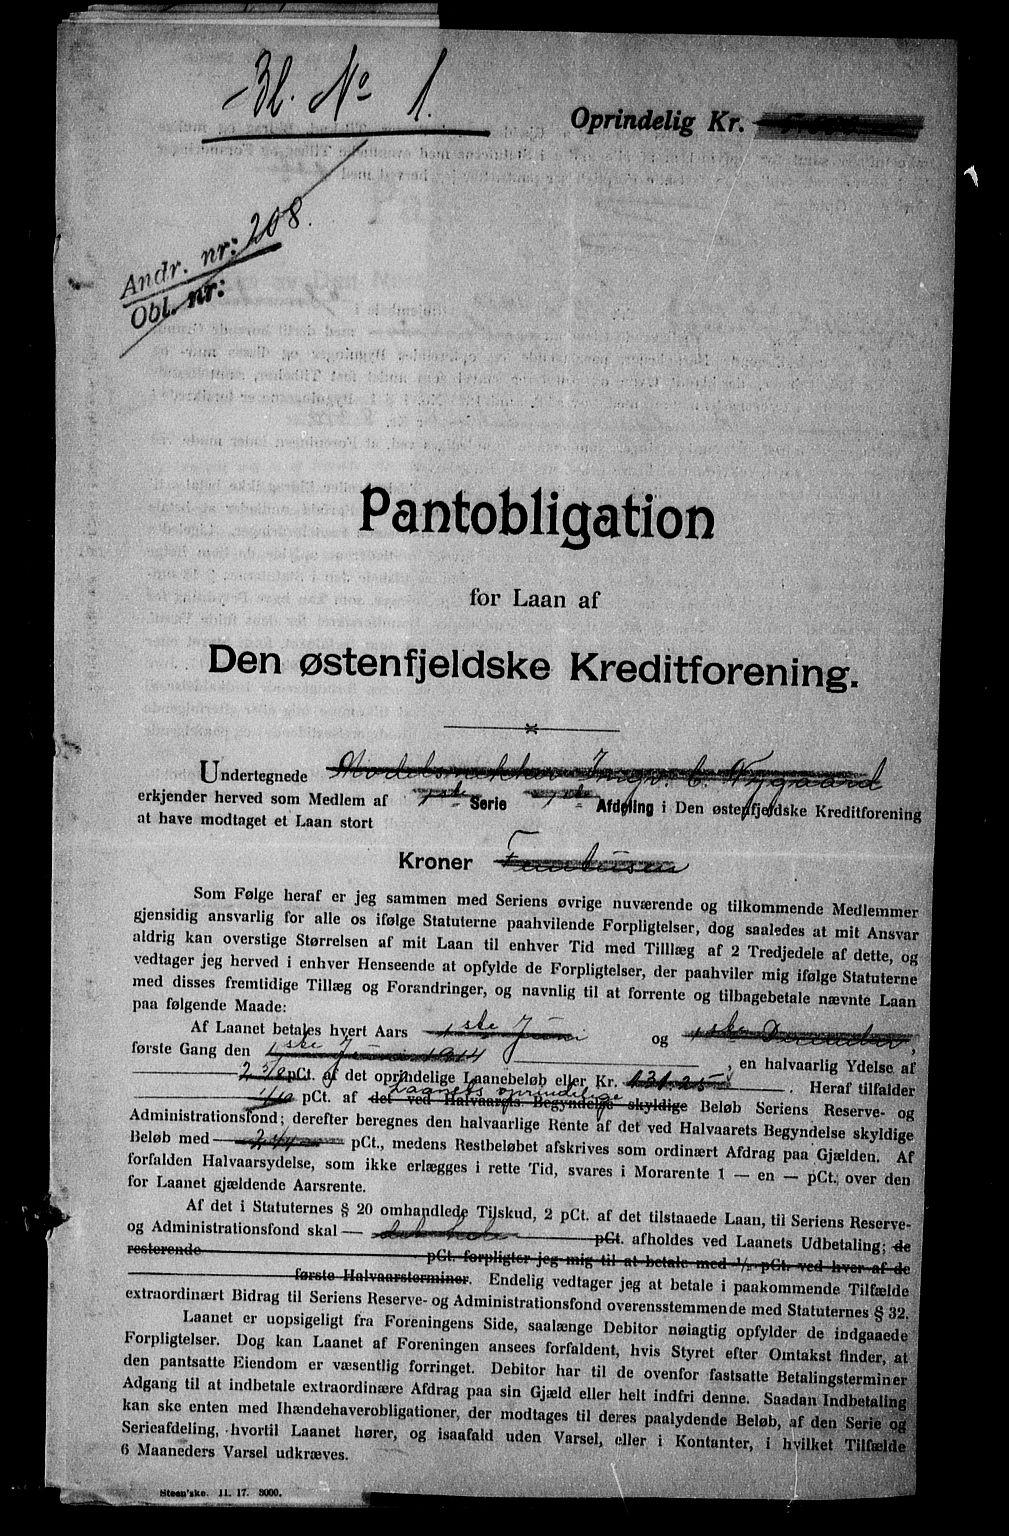 SAO, Onsøy sorenskriveri, G/Ga/Gaa/L0045: Pantebok nr. I 45, 1916-1917, s. 1